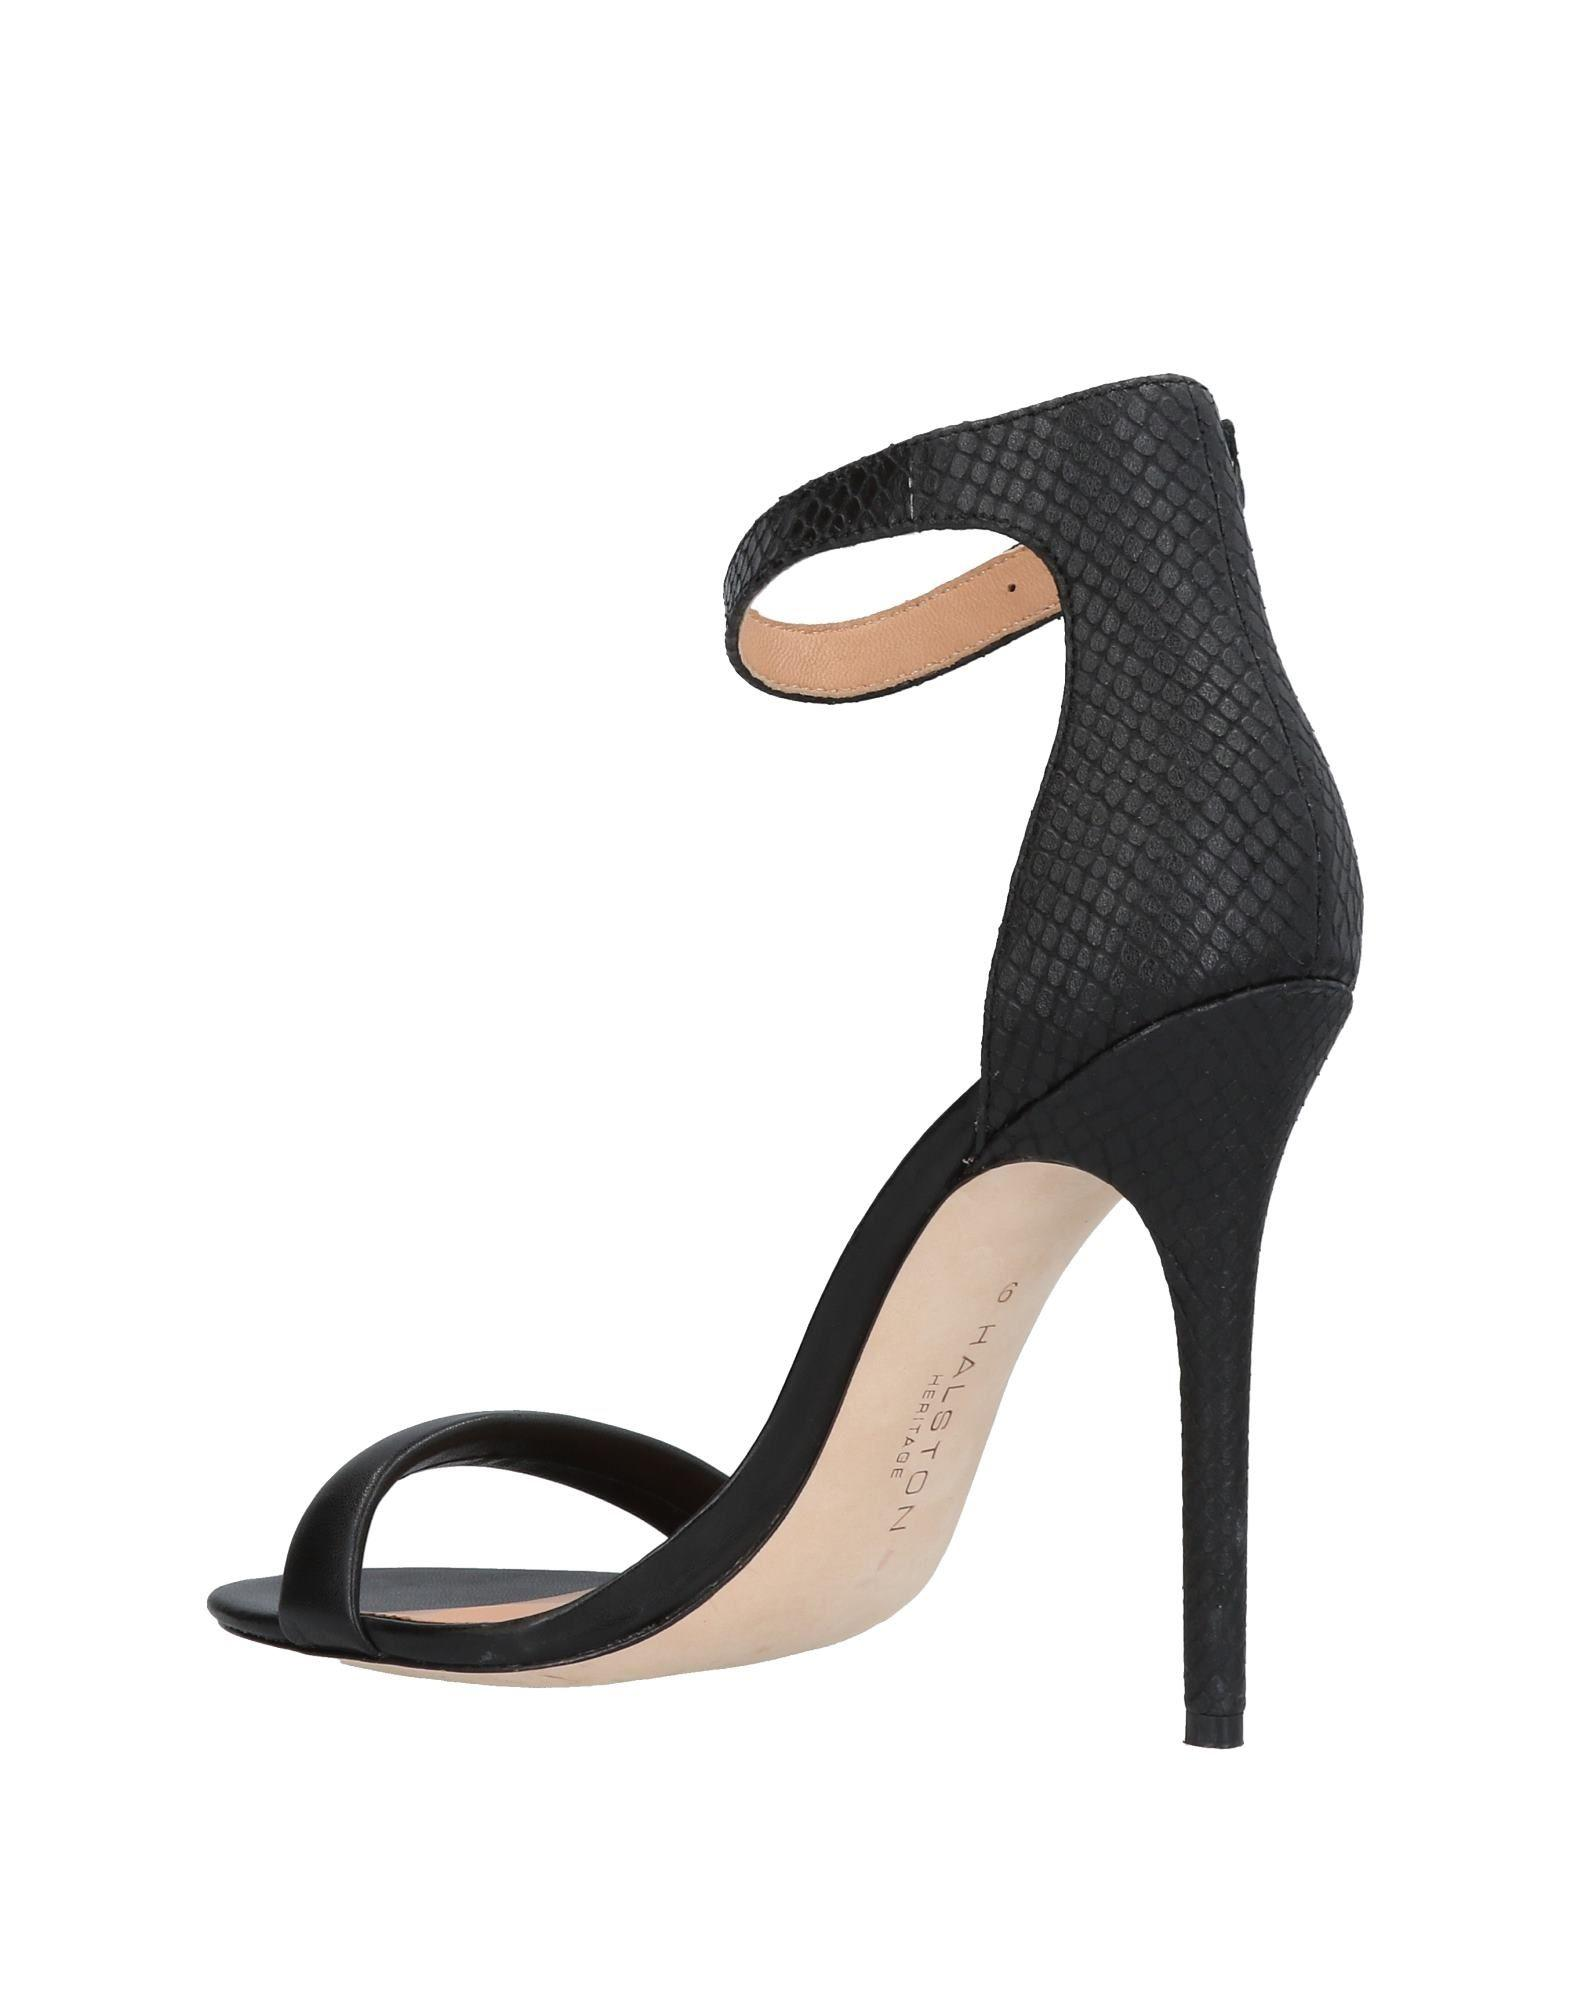 68b3b5b41da Lyst - Halston Heritage Sandals in Black